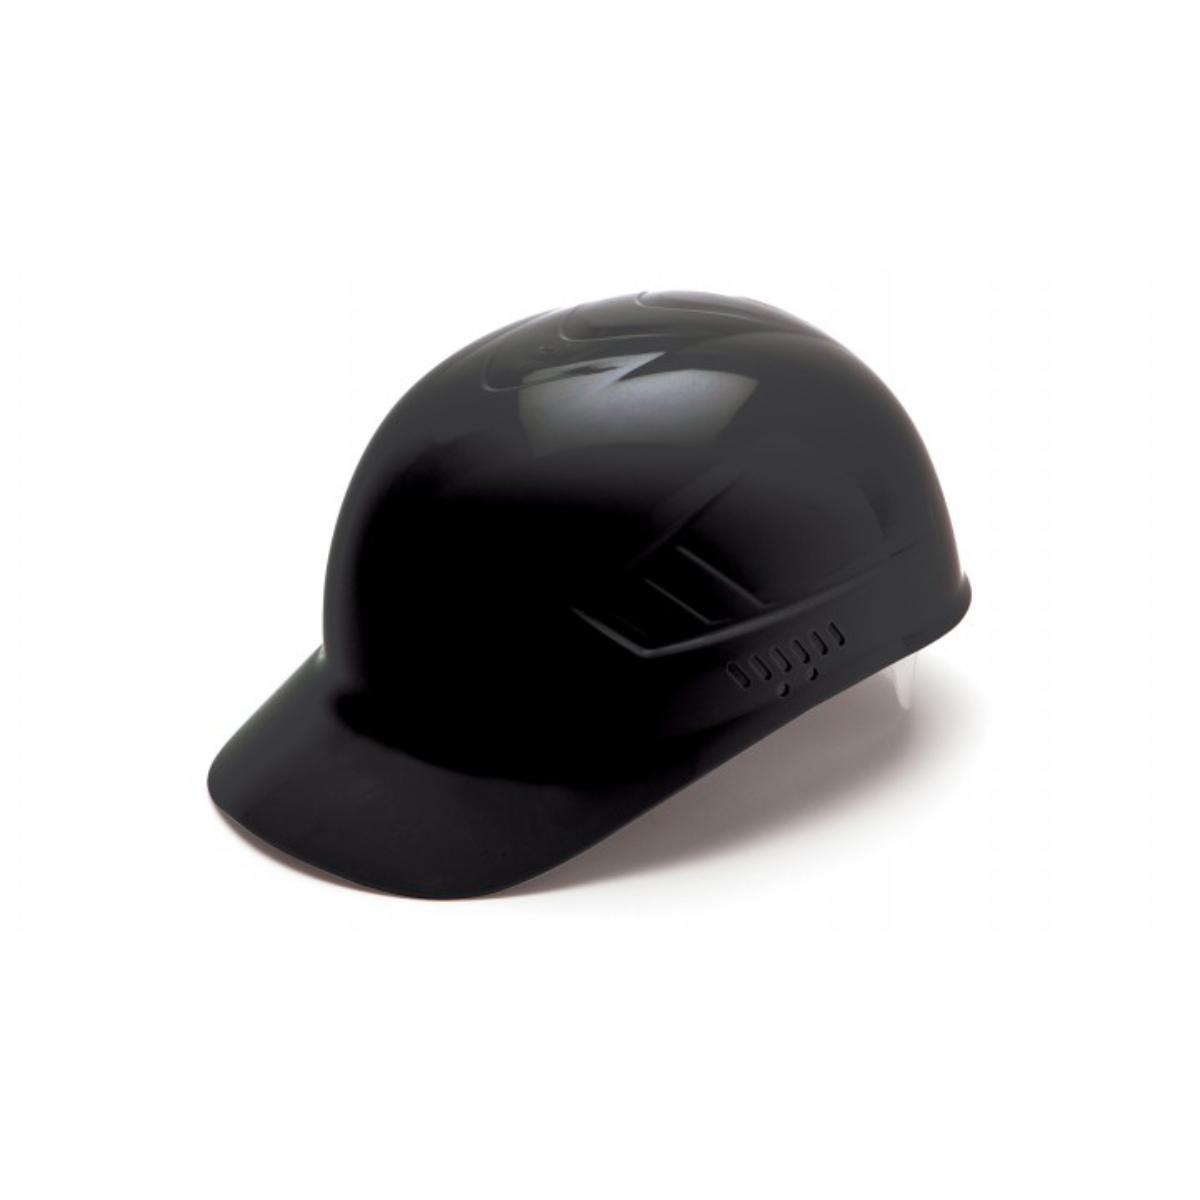 Ridgeline Bump Cap Black